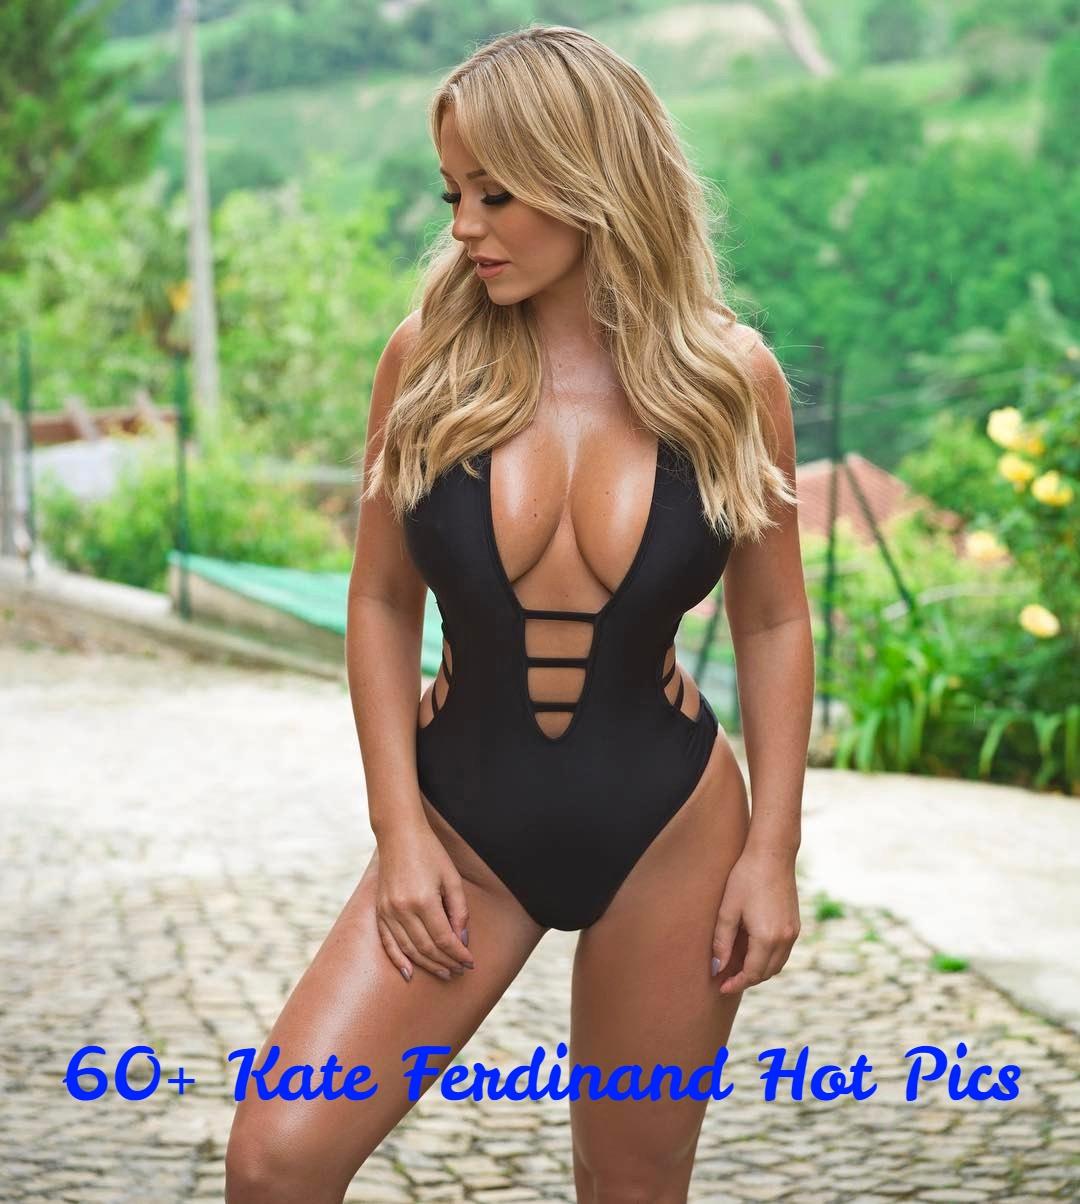 Kate Ferdinand hot pcis